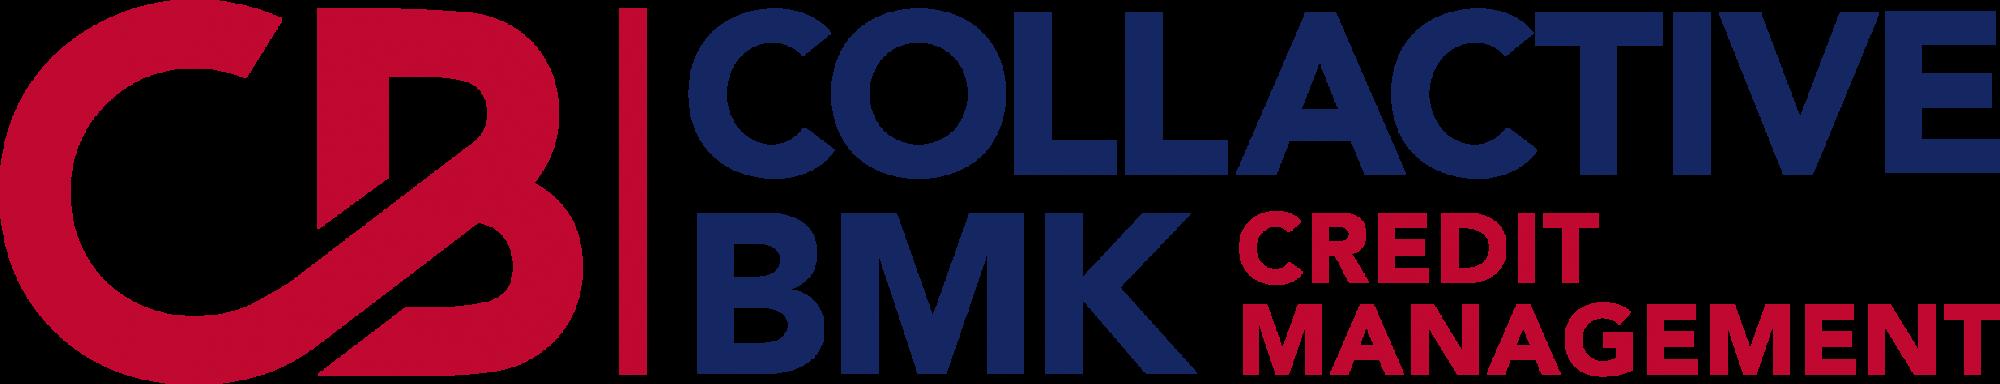 Logo CollactiveBMK RGB.png